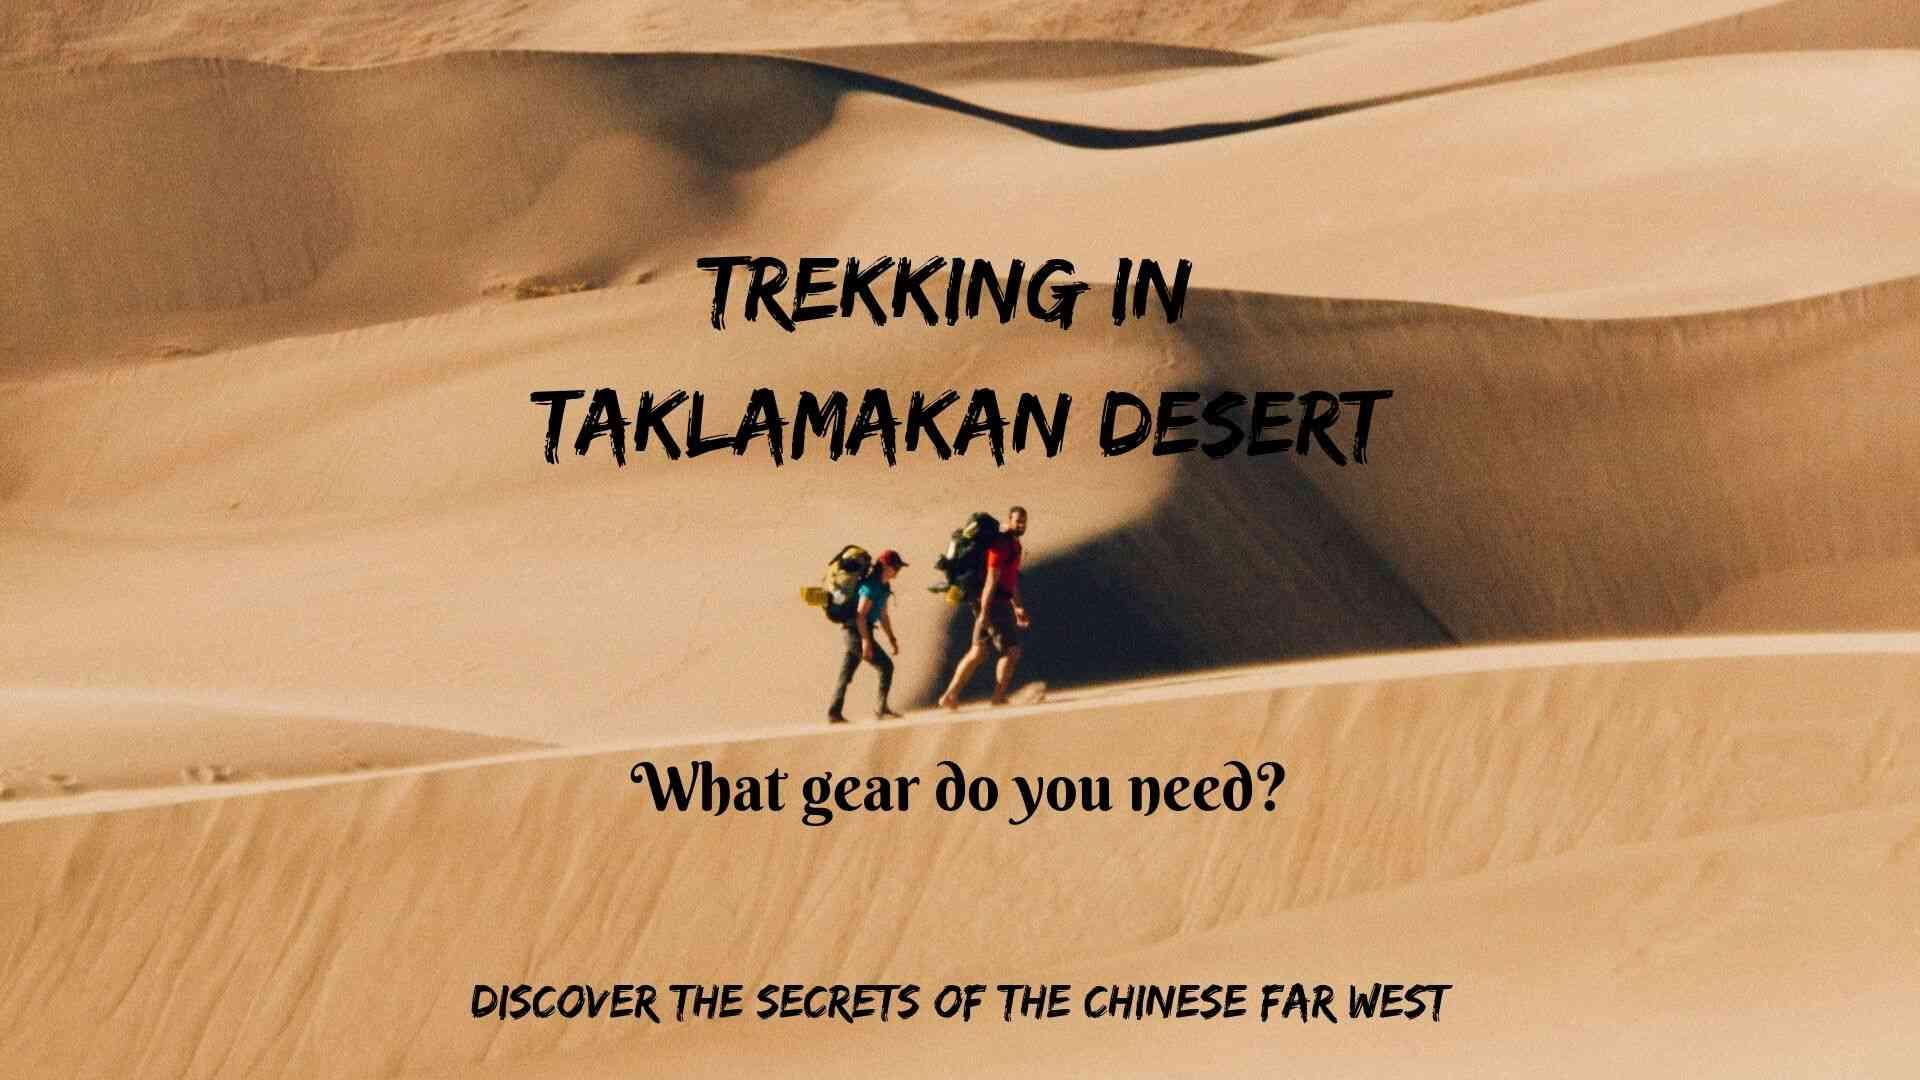 Trekking in Taklamakan Desert- what gear do you need?